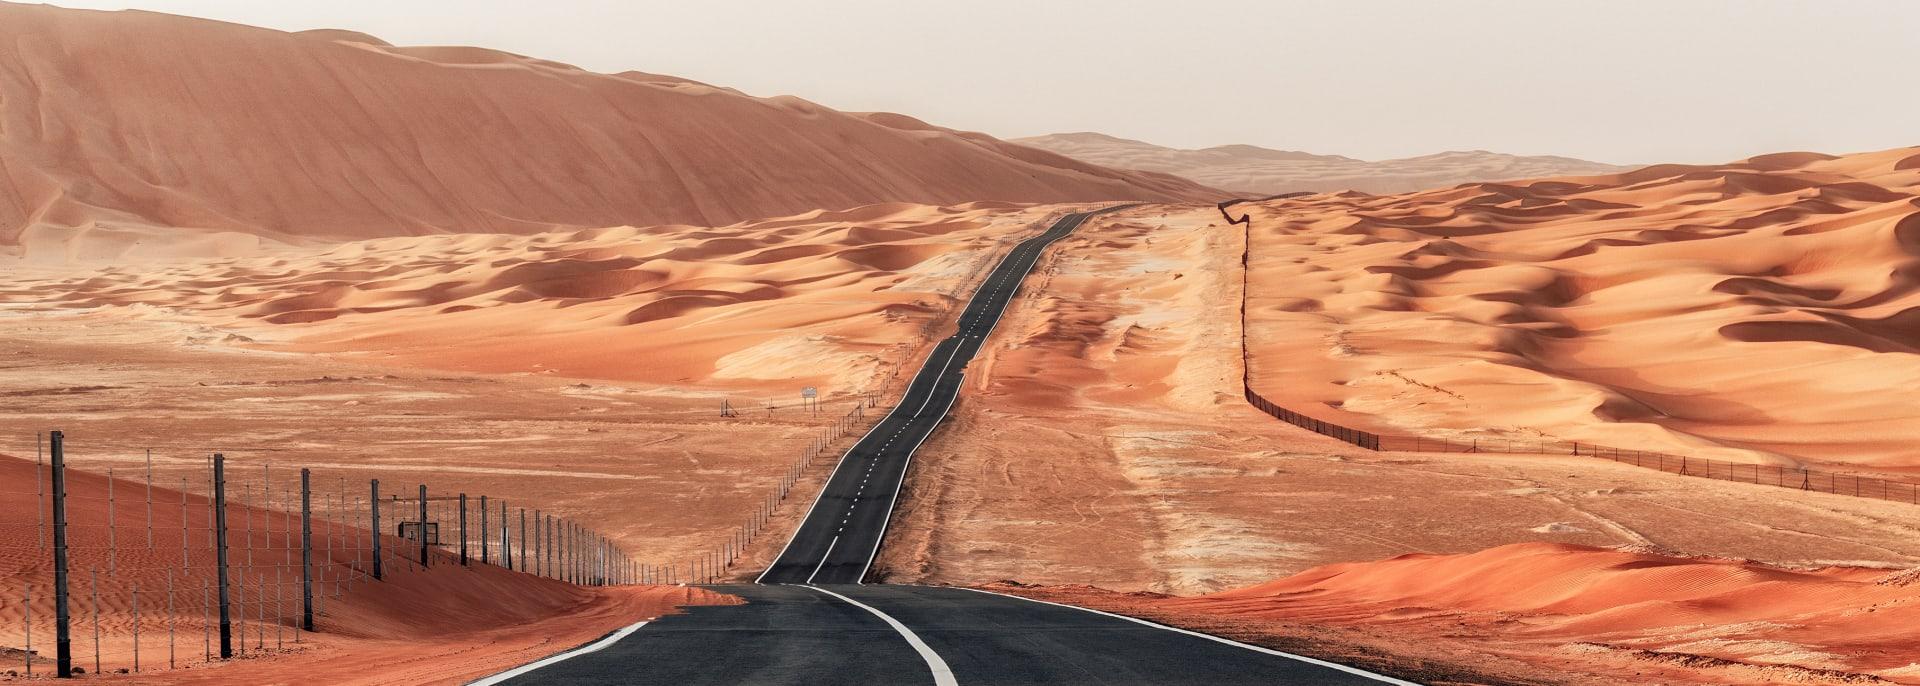 Rub Al Khali, Oman